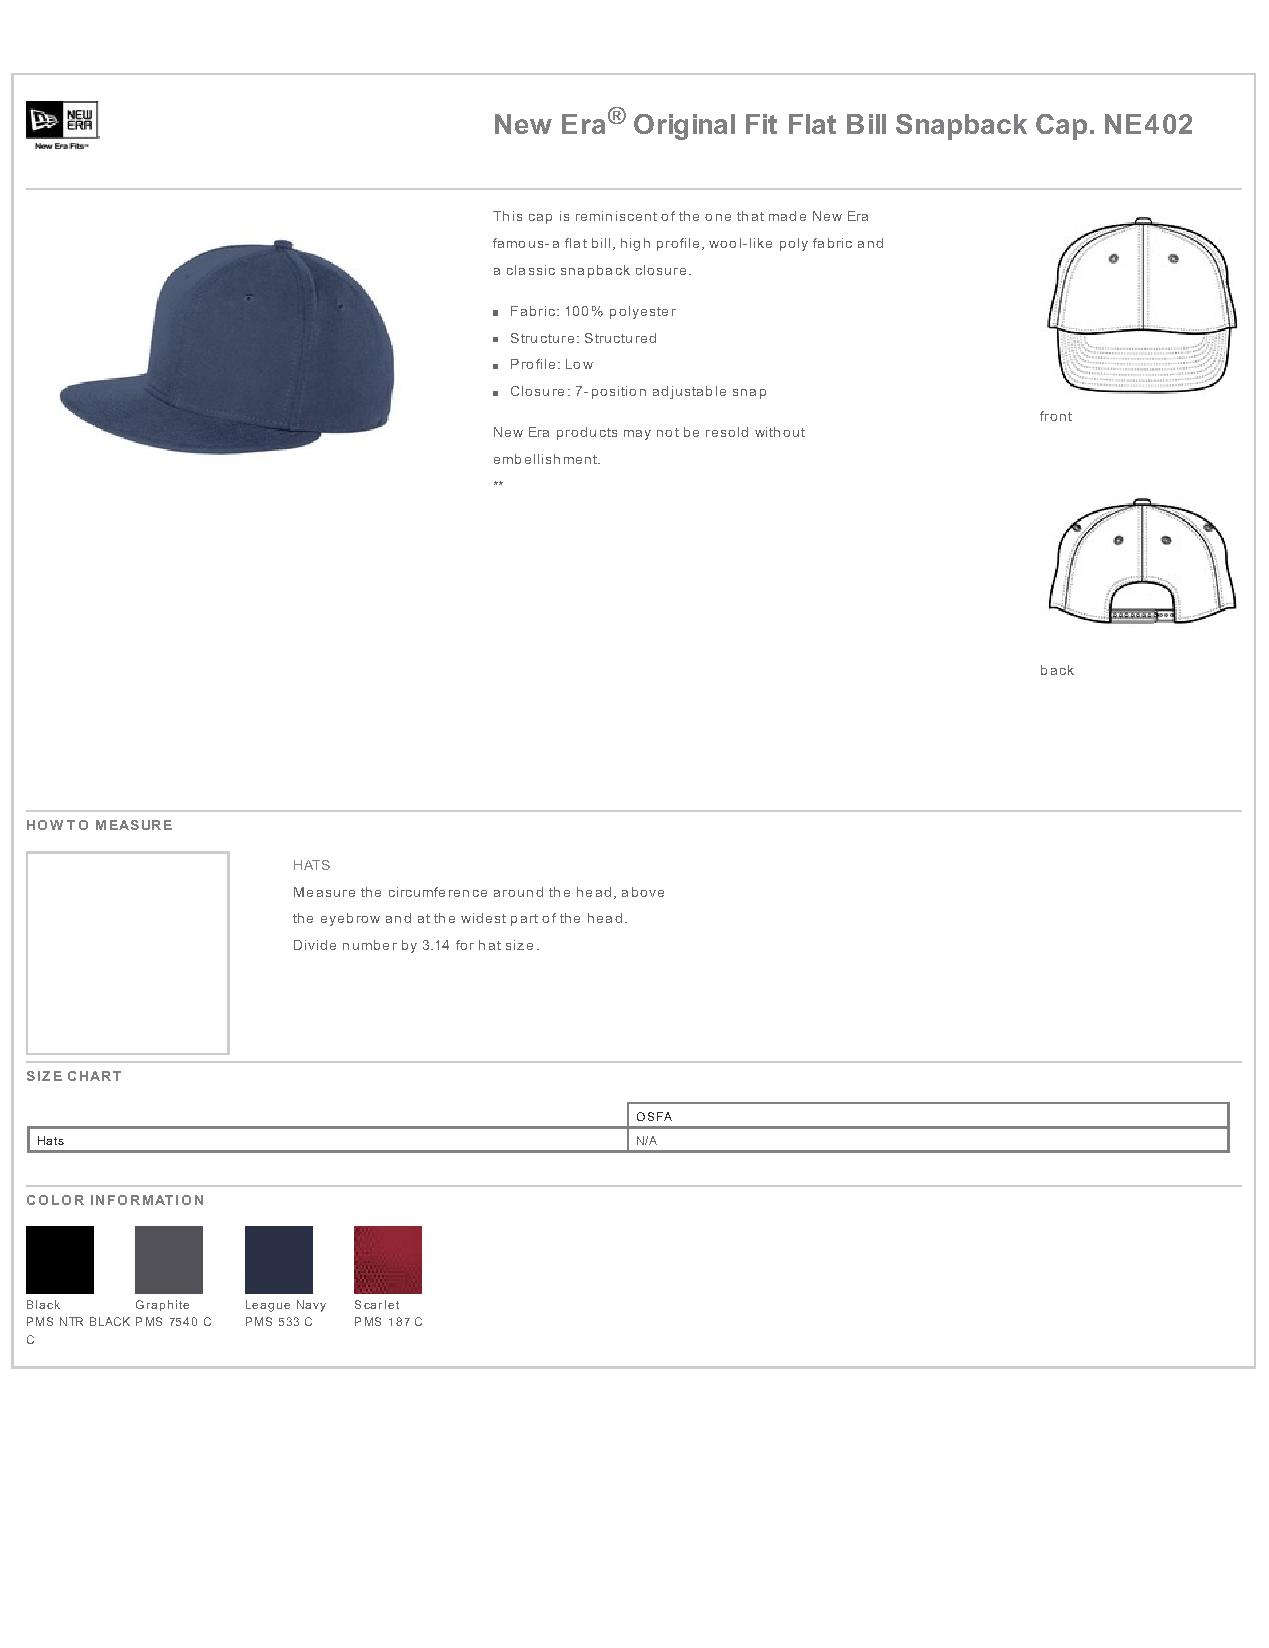 b5297786490a6 Popular Designs. custom design of New Era® NE402 - Original Fit Flat Bill  Snapback Cap